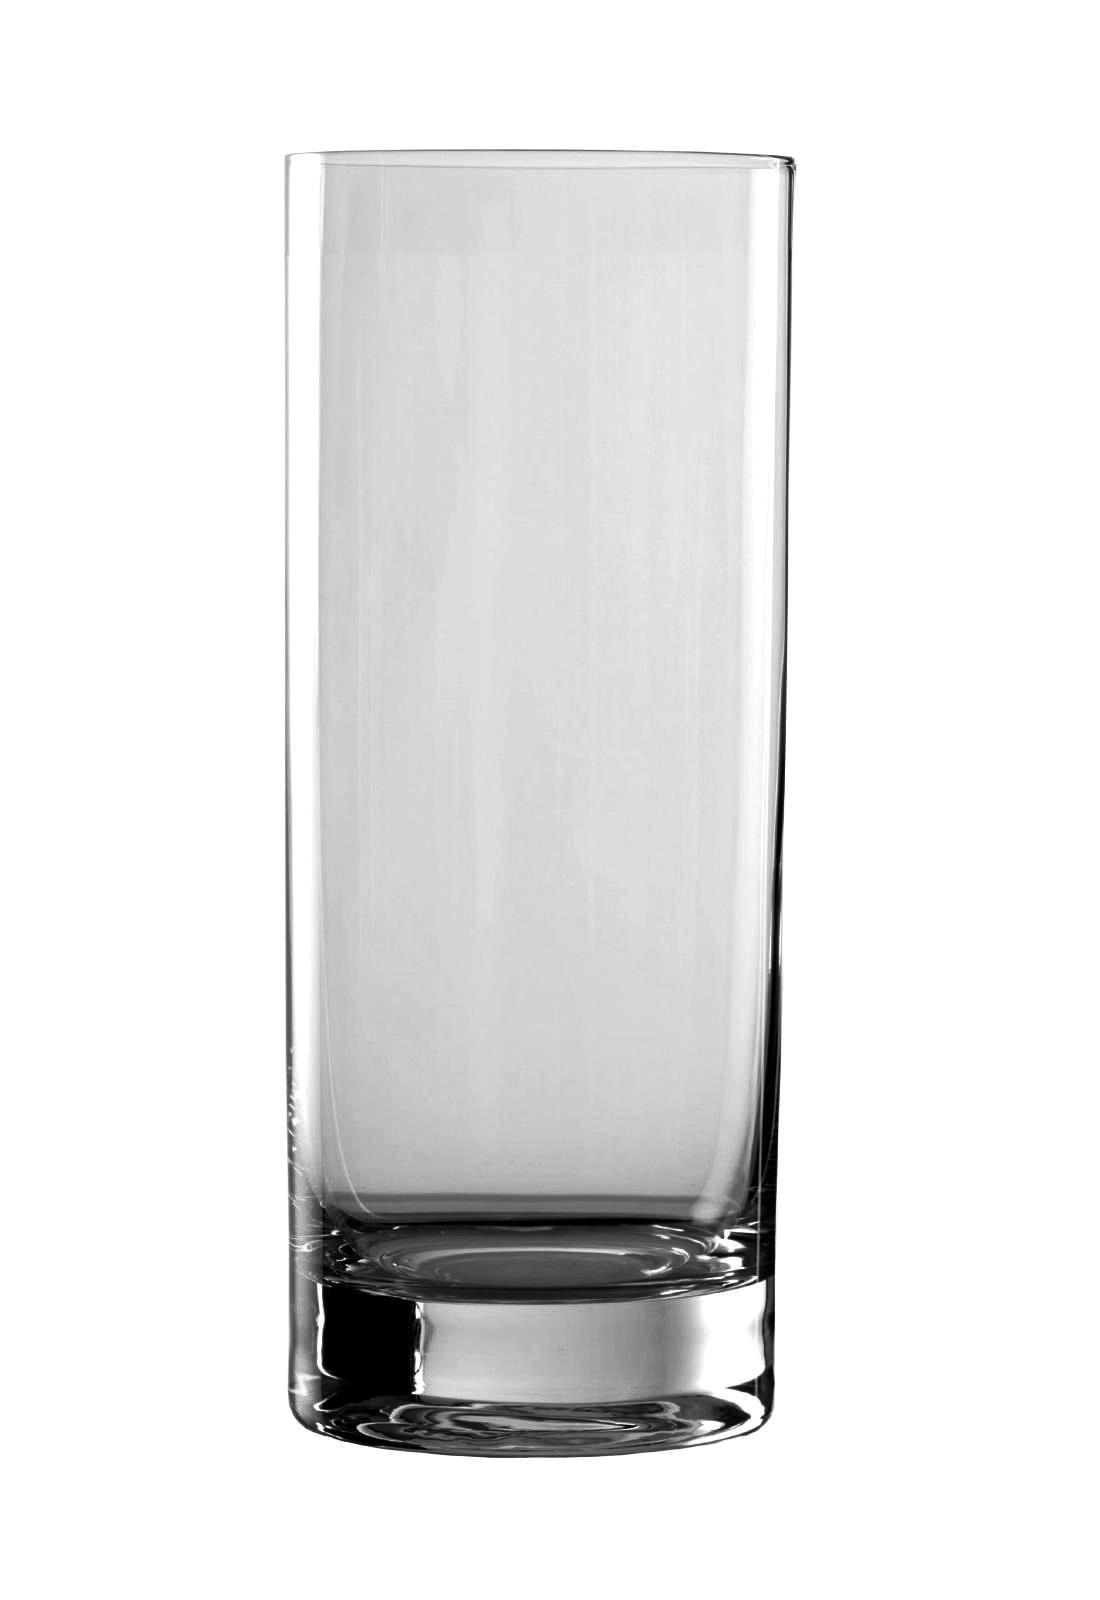 Stolzle New York Bar Longdrink Glasses, Set of 6